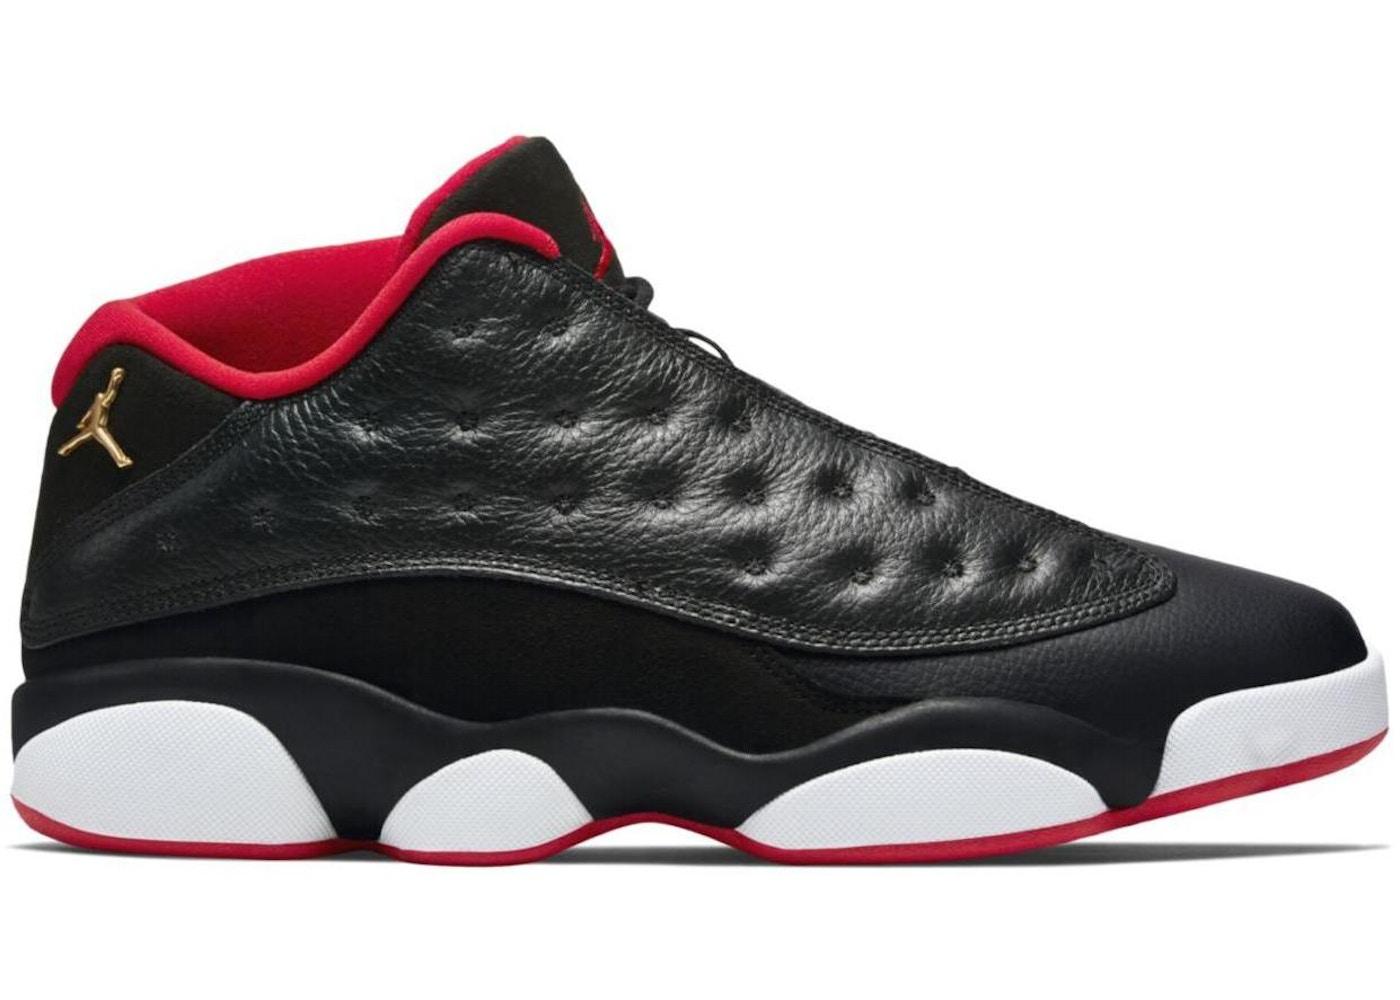 1627b7a701e Buy Air Jordan 13 Shoes & Deadstock Sneakers